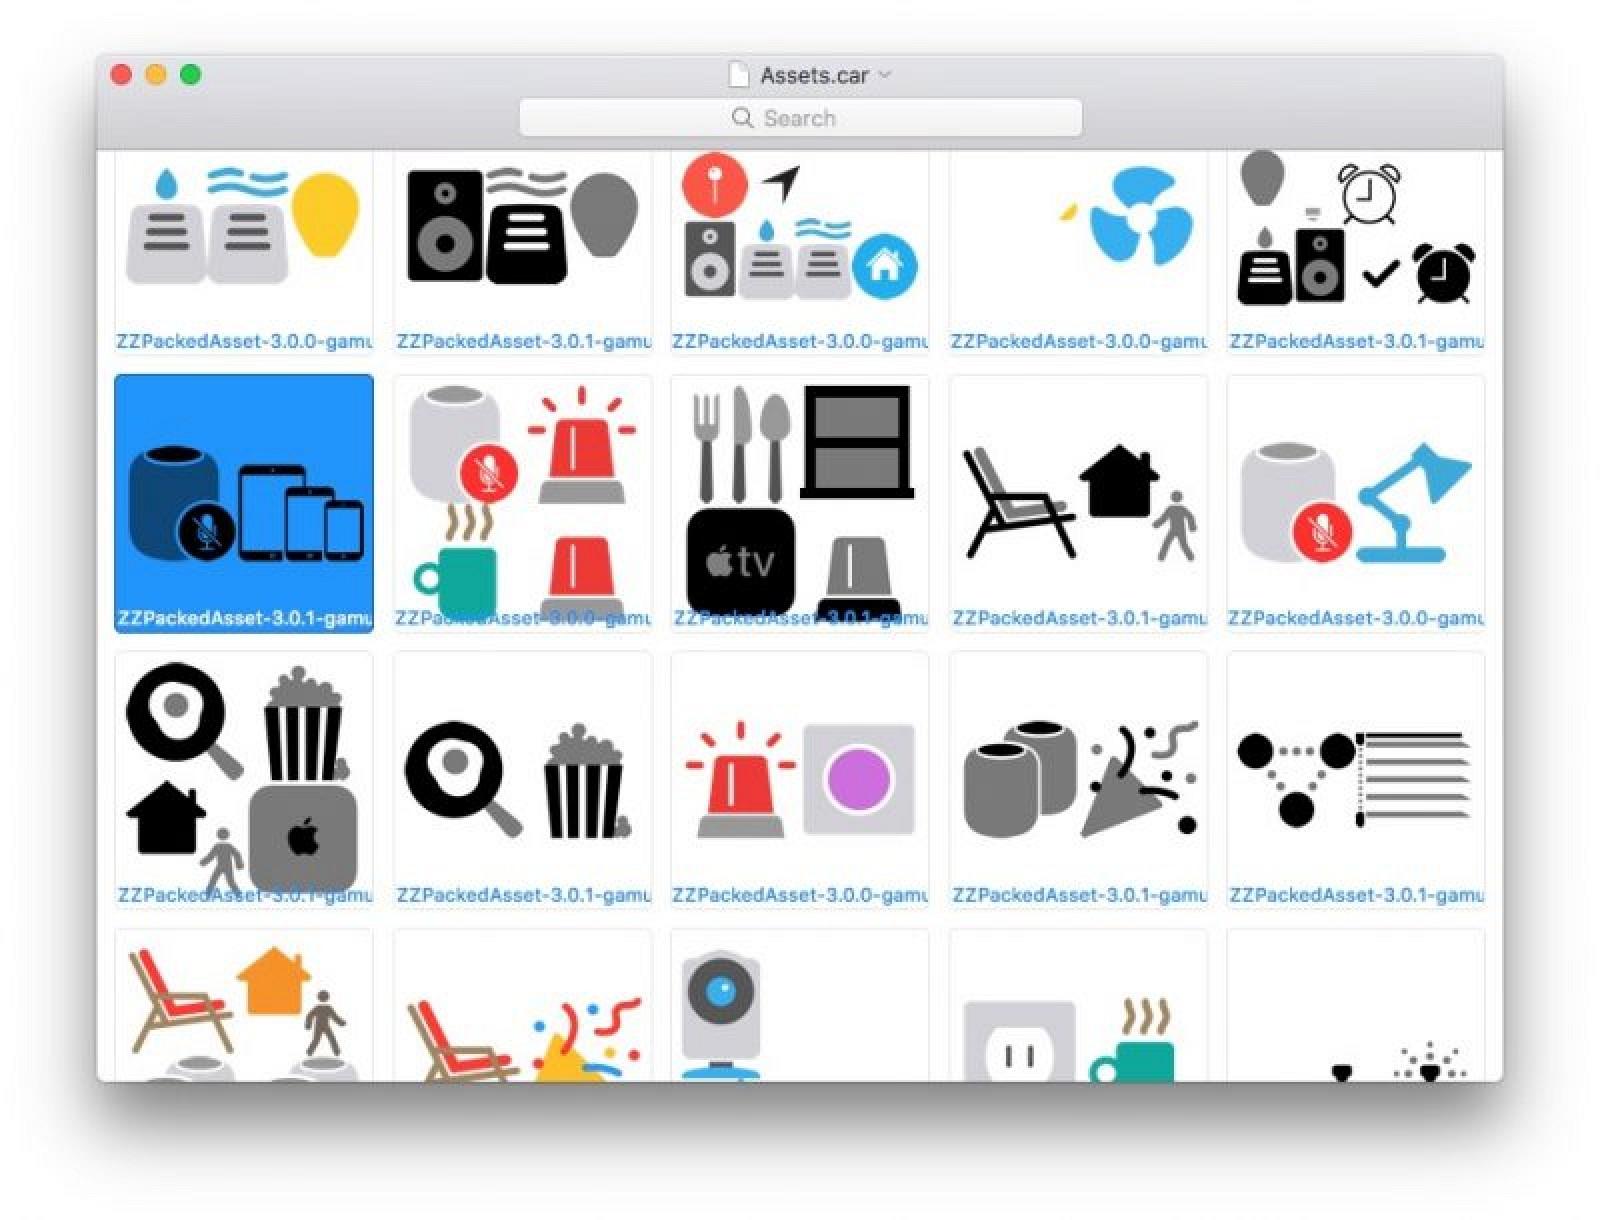 HomePod May Support Multiple User Accounts and HomeKit Scenes That Mute Siri